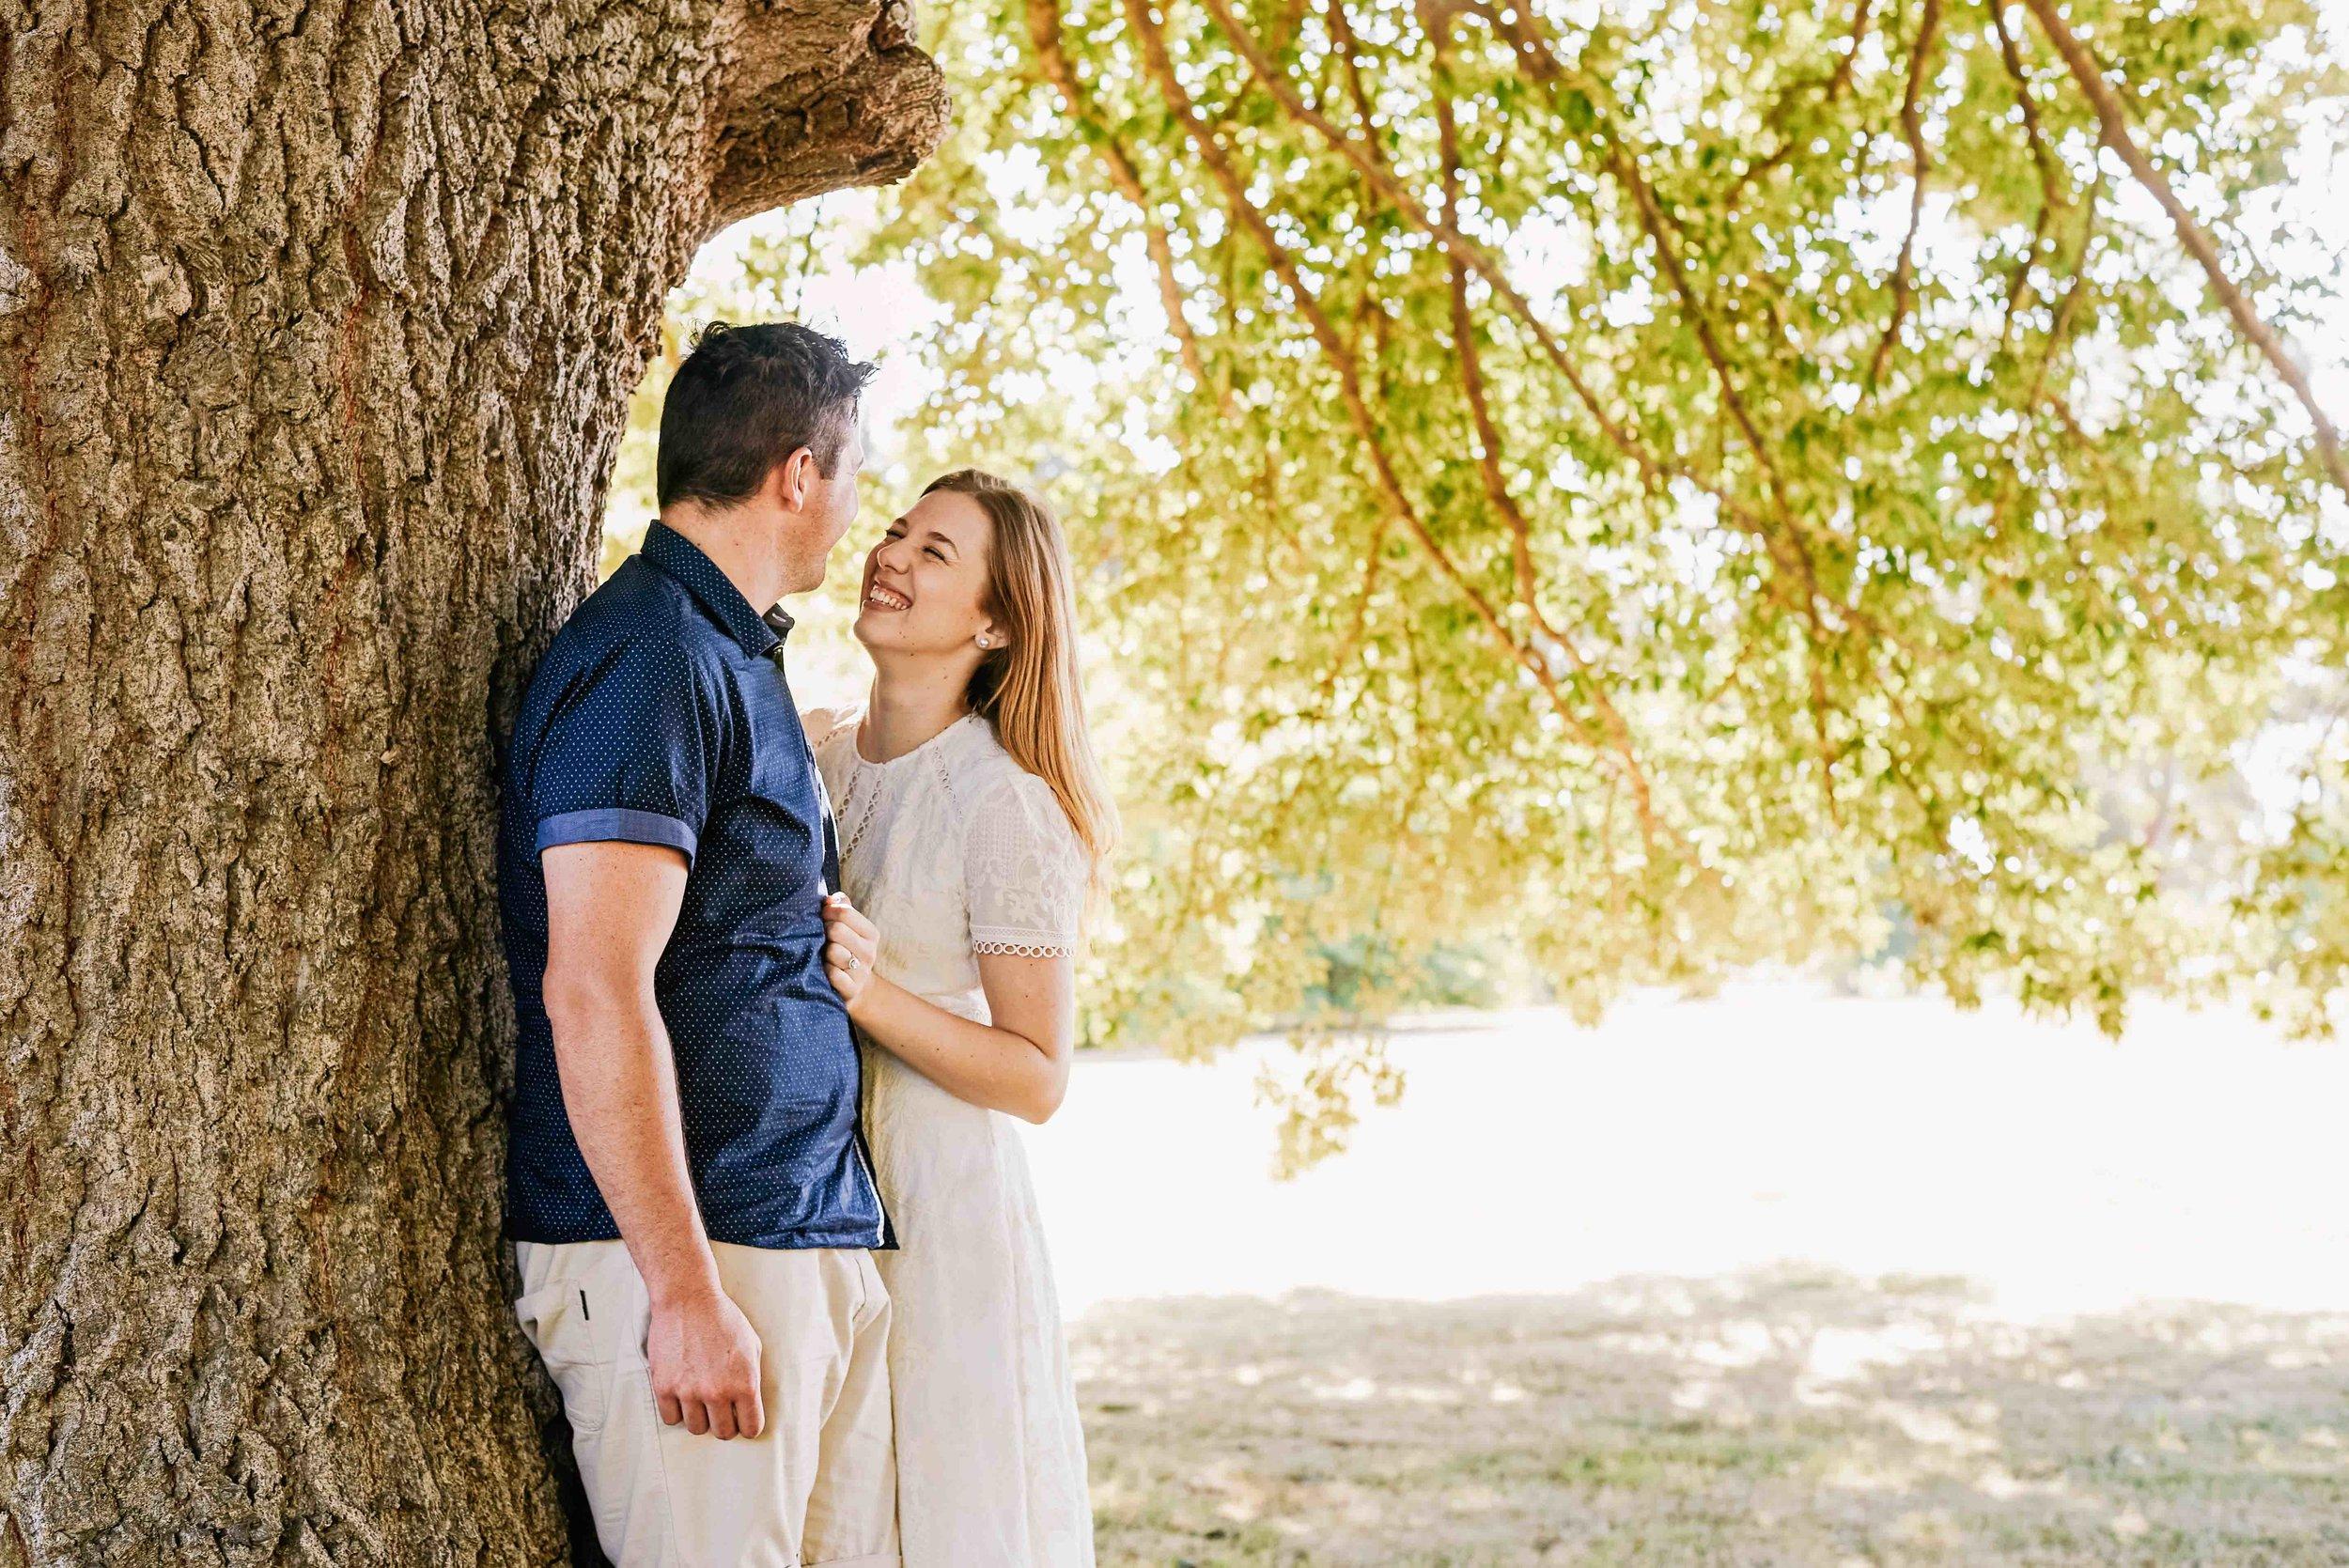 marissa-jade-photography-mornington-peninsula-wedding-photographer-natural-engagement-photography-red-hill-85.jpg